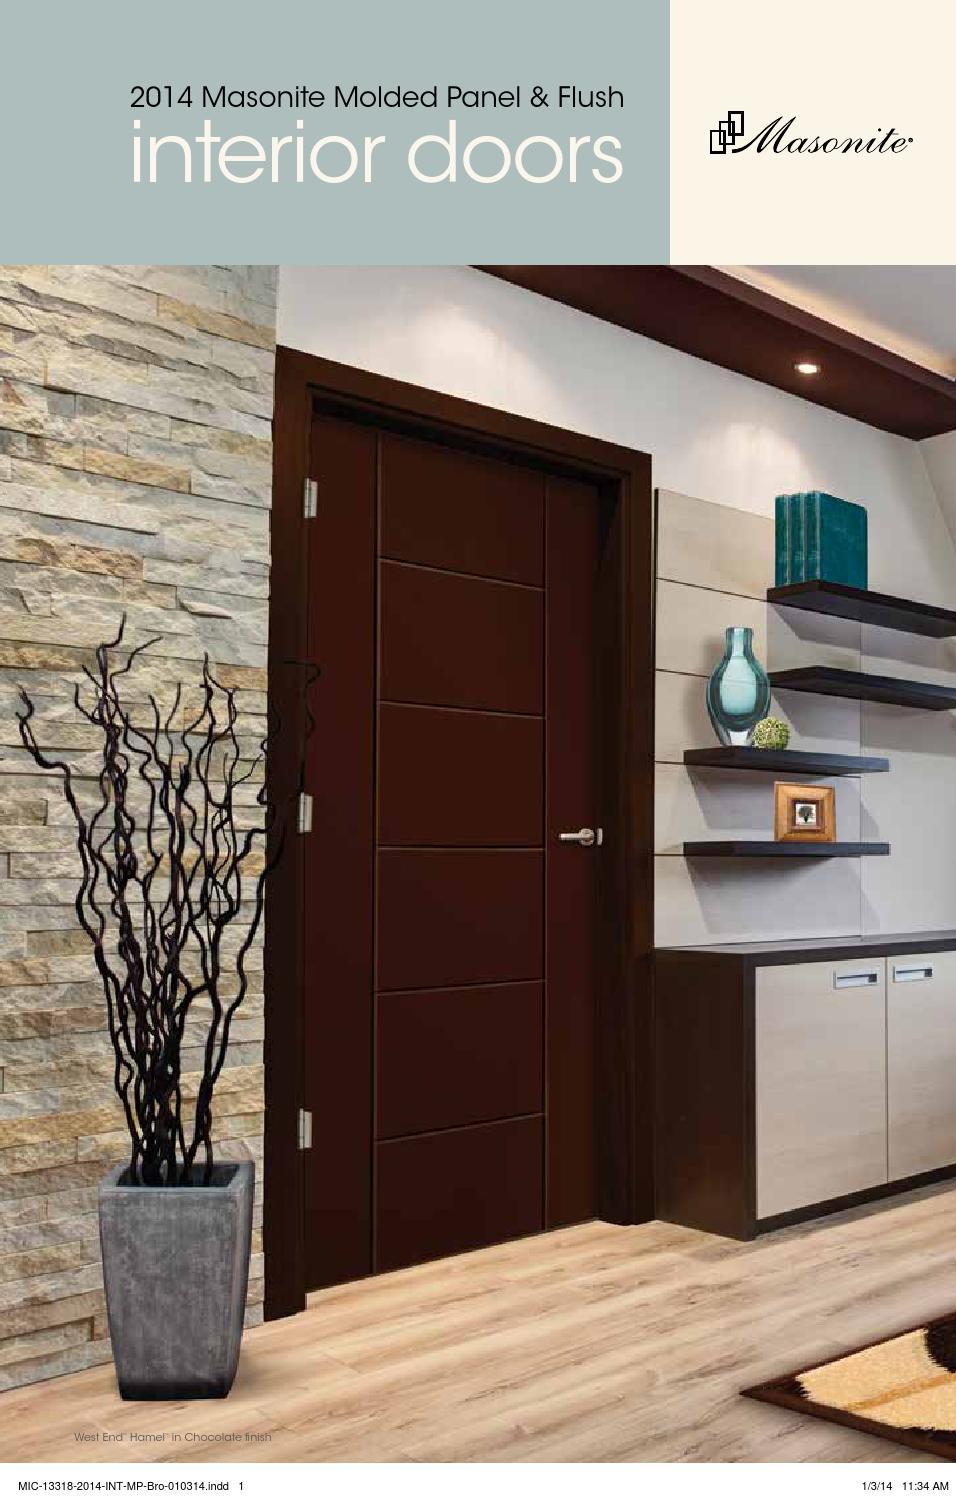 2014 Masonite Interior Door Catalog By Meek Lumber Company